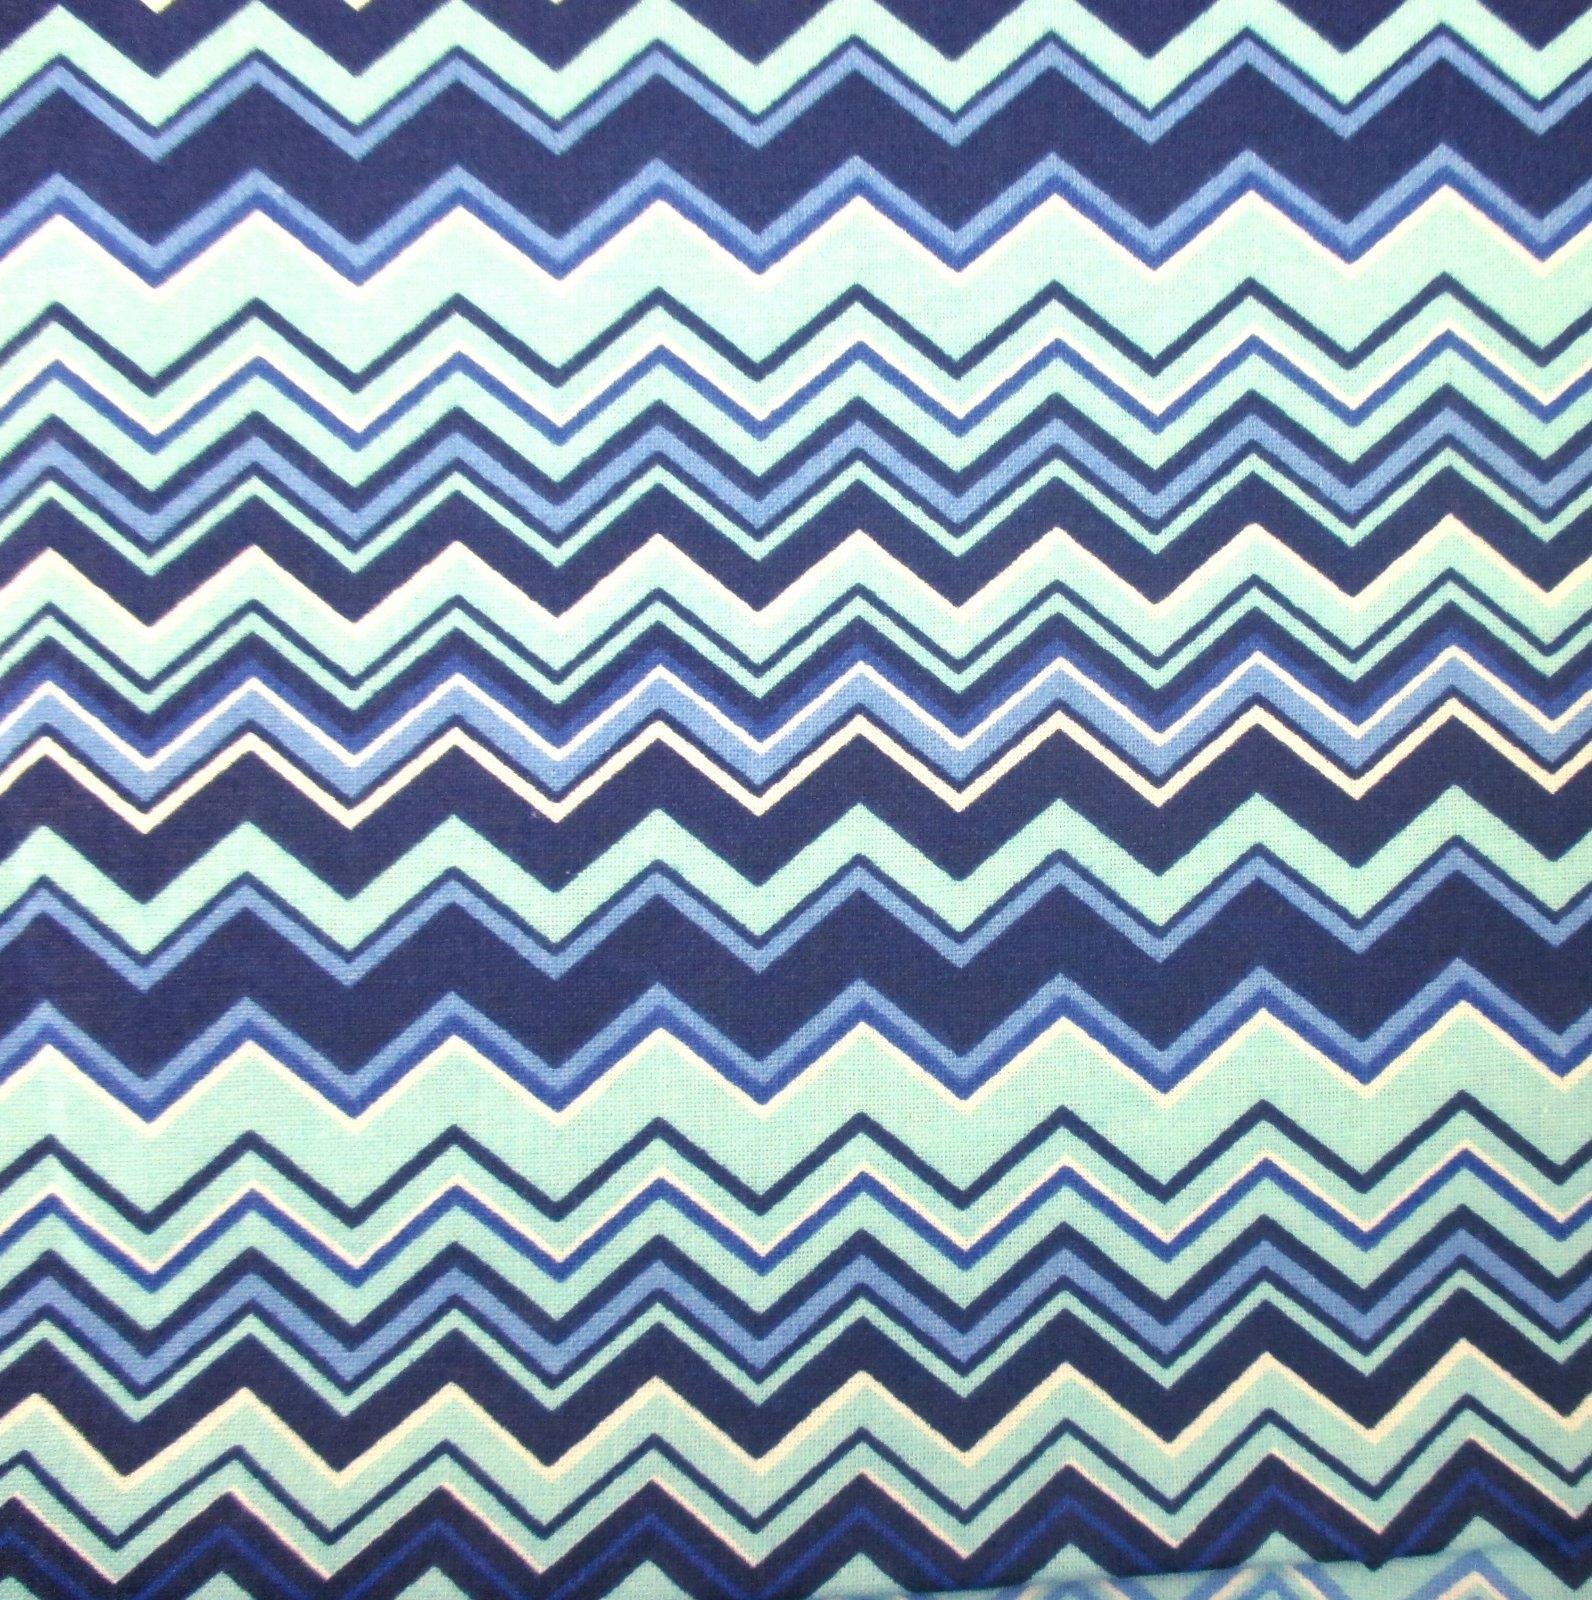 A.E. Nathan - Chevron - Blue/Aqua/White